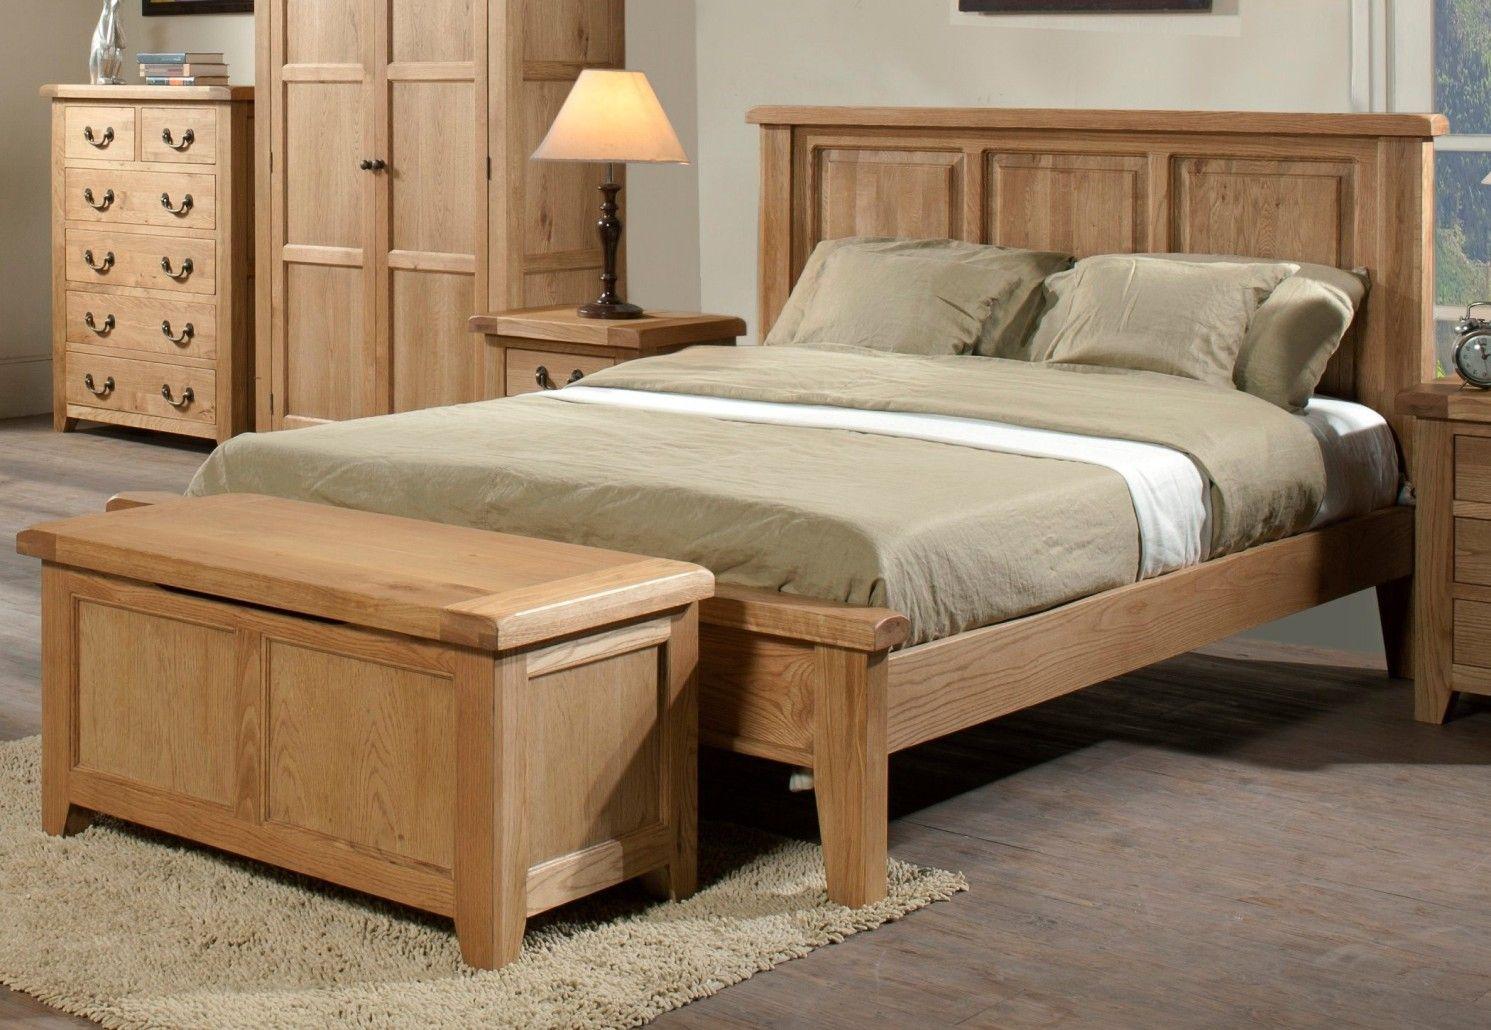 8 Advantages of Oak Bedroom Furniture | bedroom | Pinterest | Oak ...